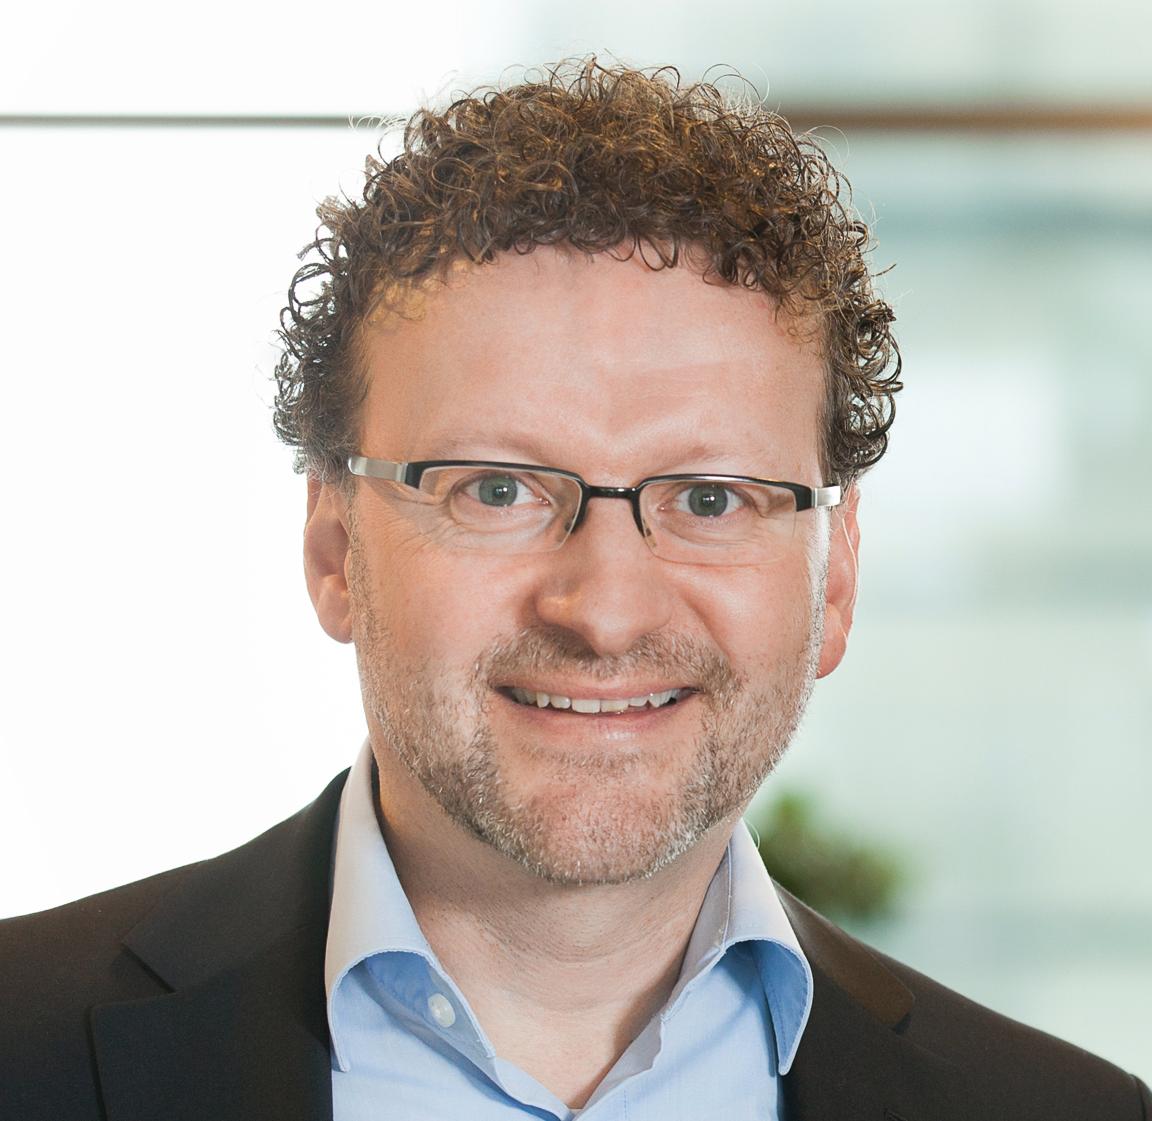 Expert Marketplace - Dipl. Psychologe Markus Dörr - Portrait